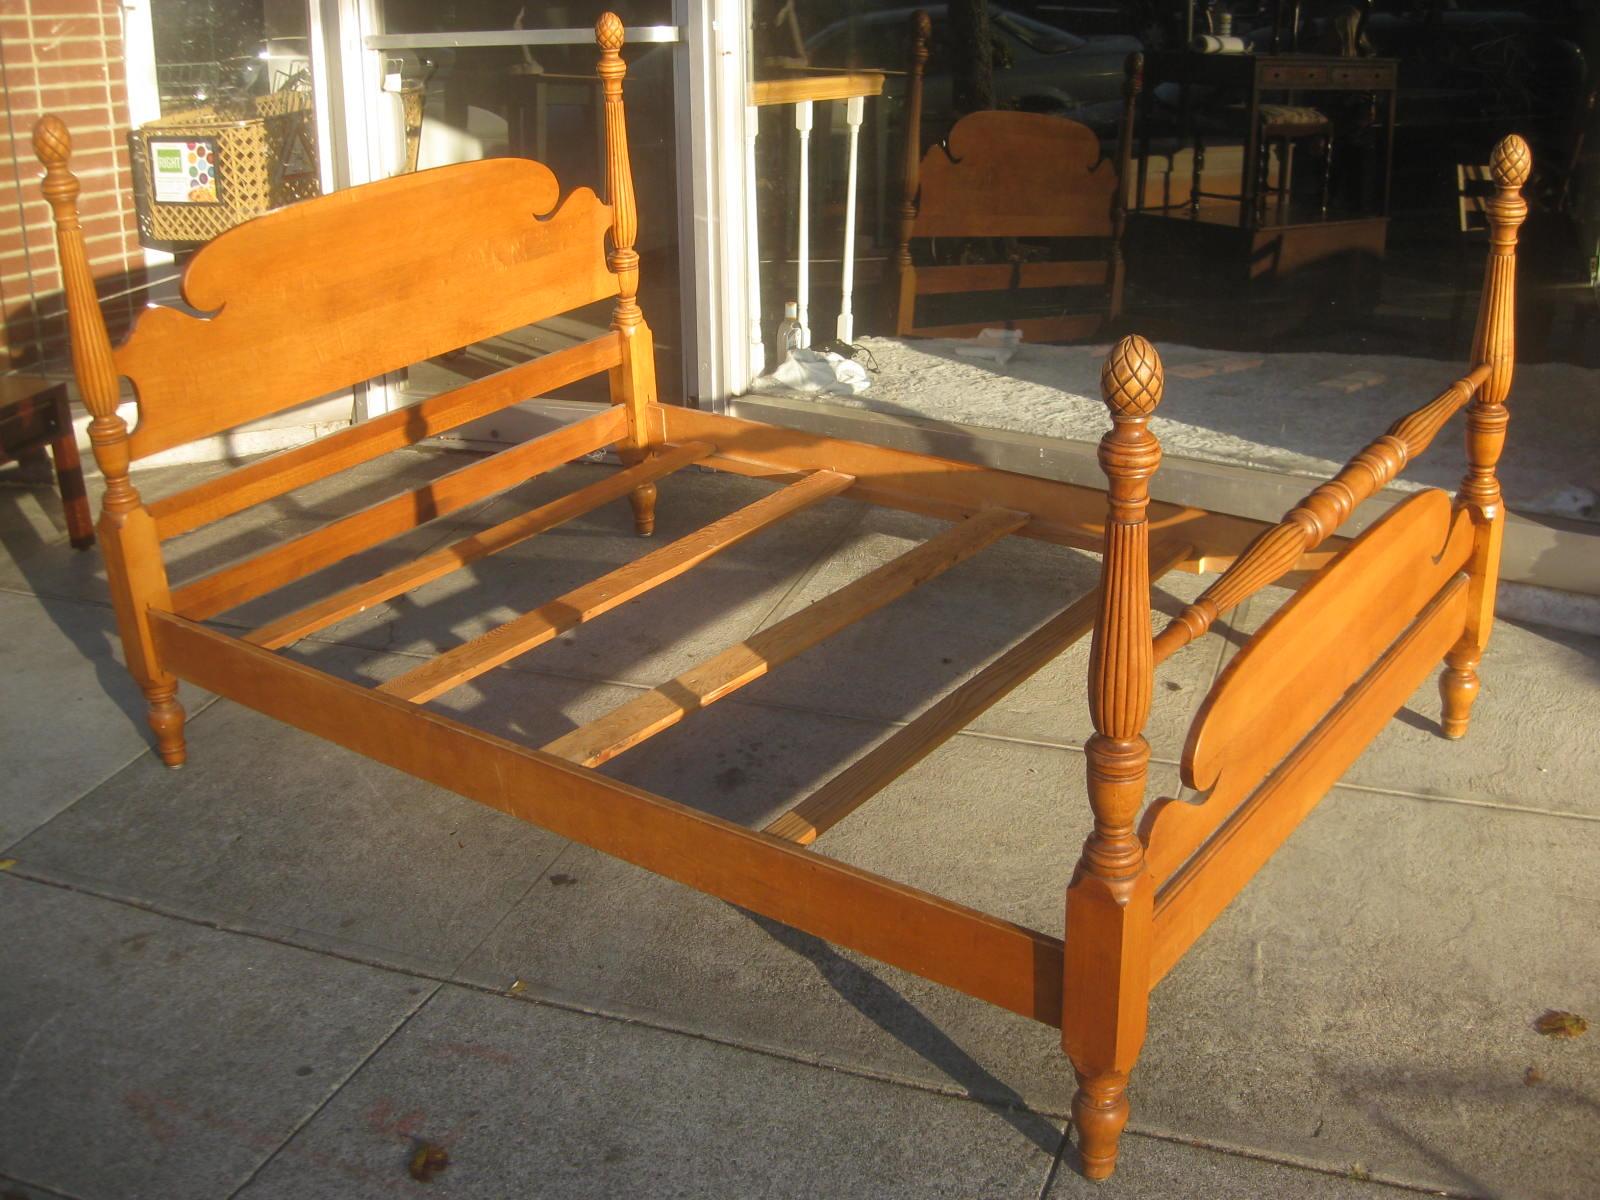 Pineapple Bedroom Furniture Wood You Furniture Furniture Design Ideas